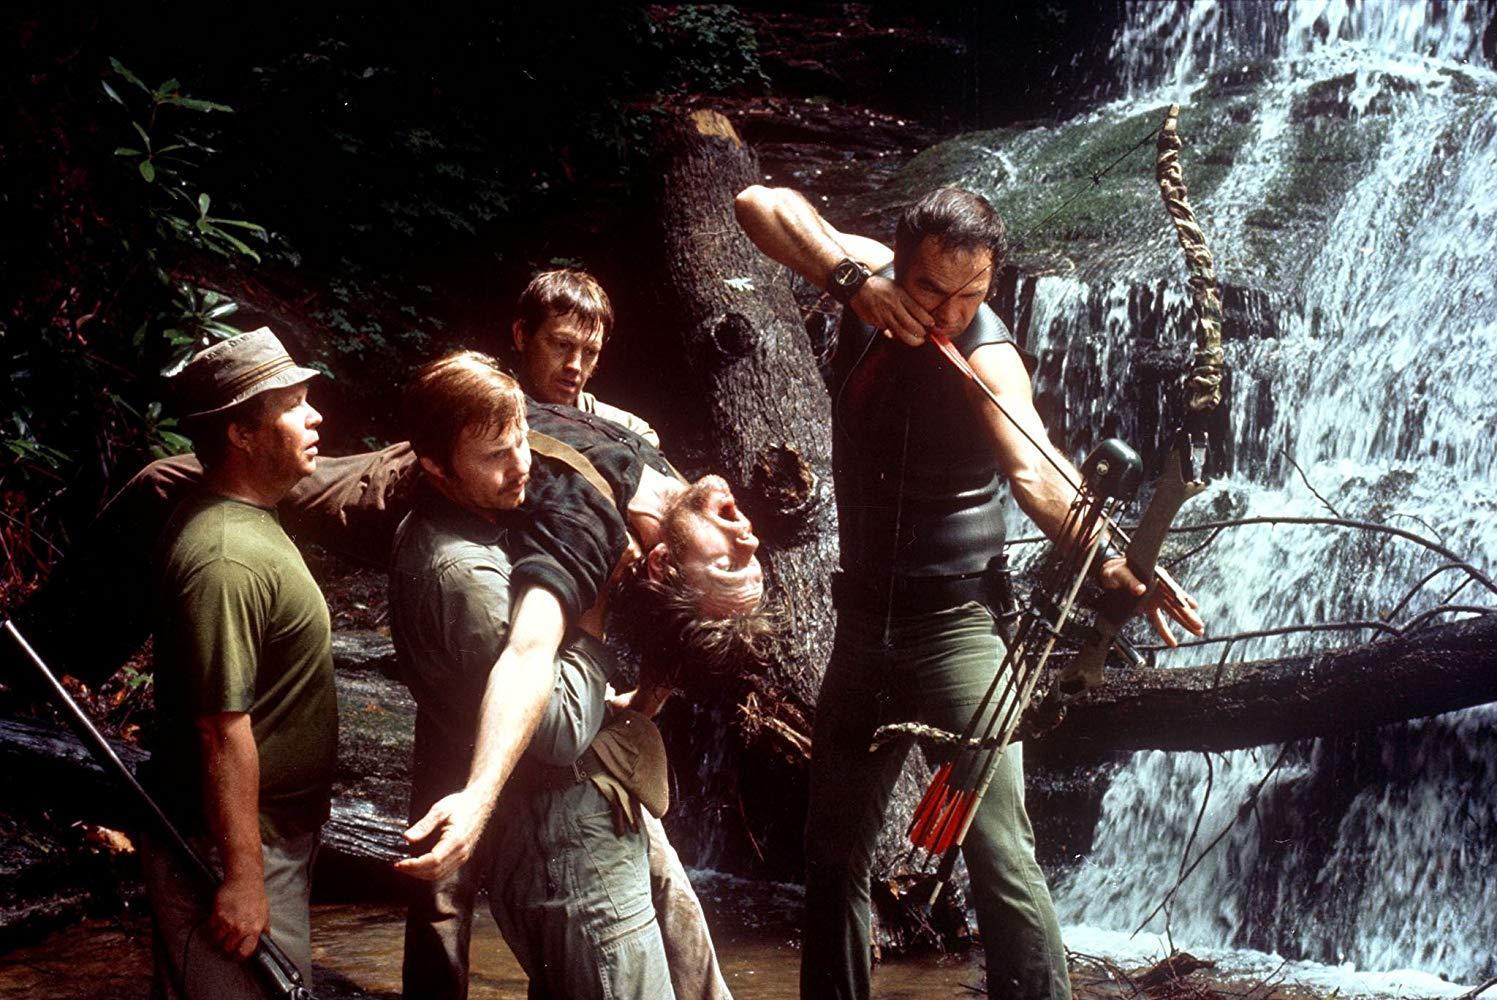 Ned Beatty, Jon Voight, Ronny Cox, Burt Reynolds carrying Bill McKinney's body in Deliverance (1972)